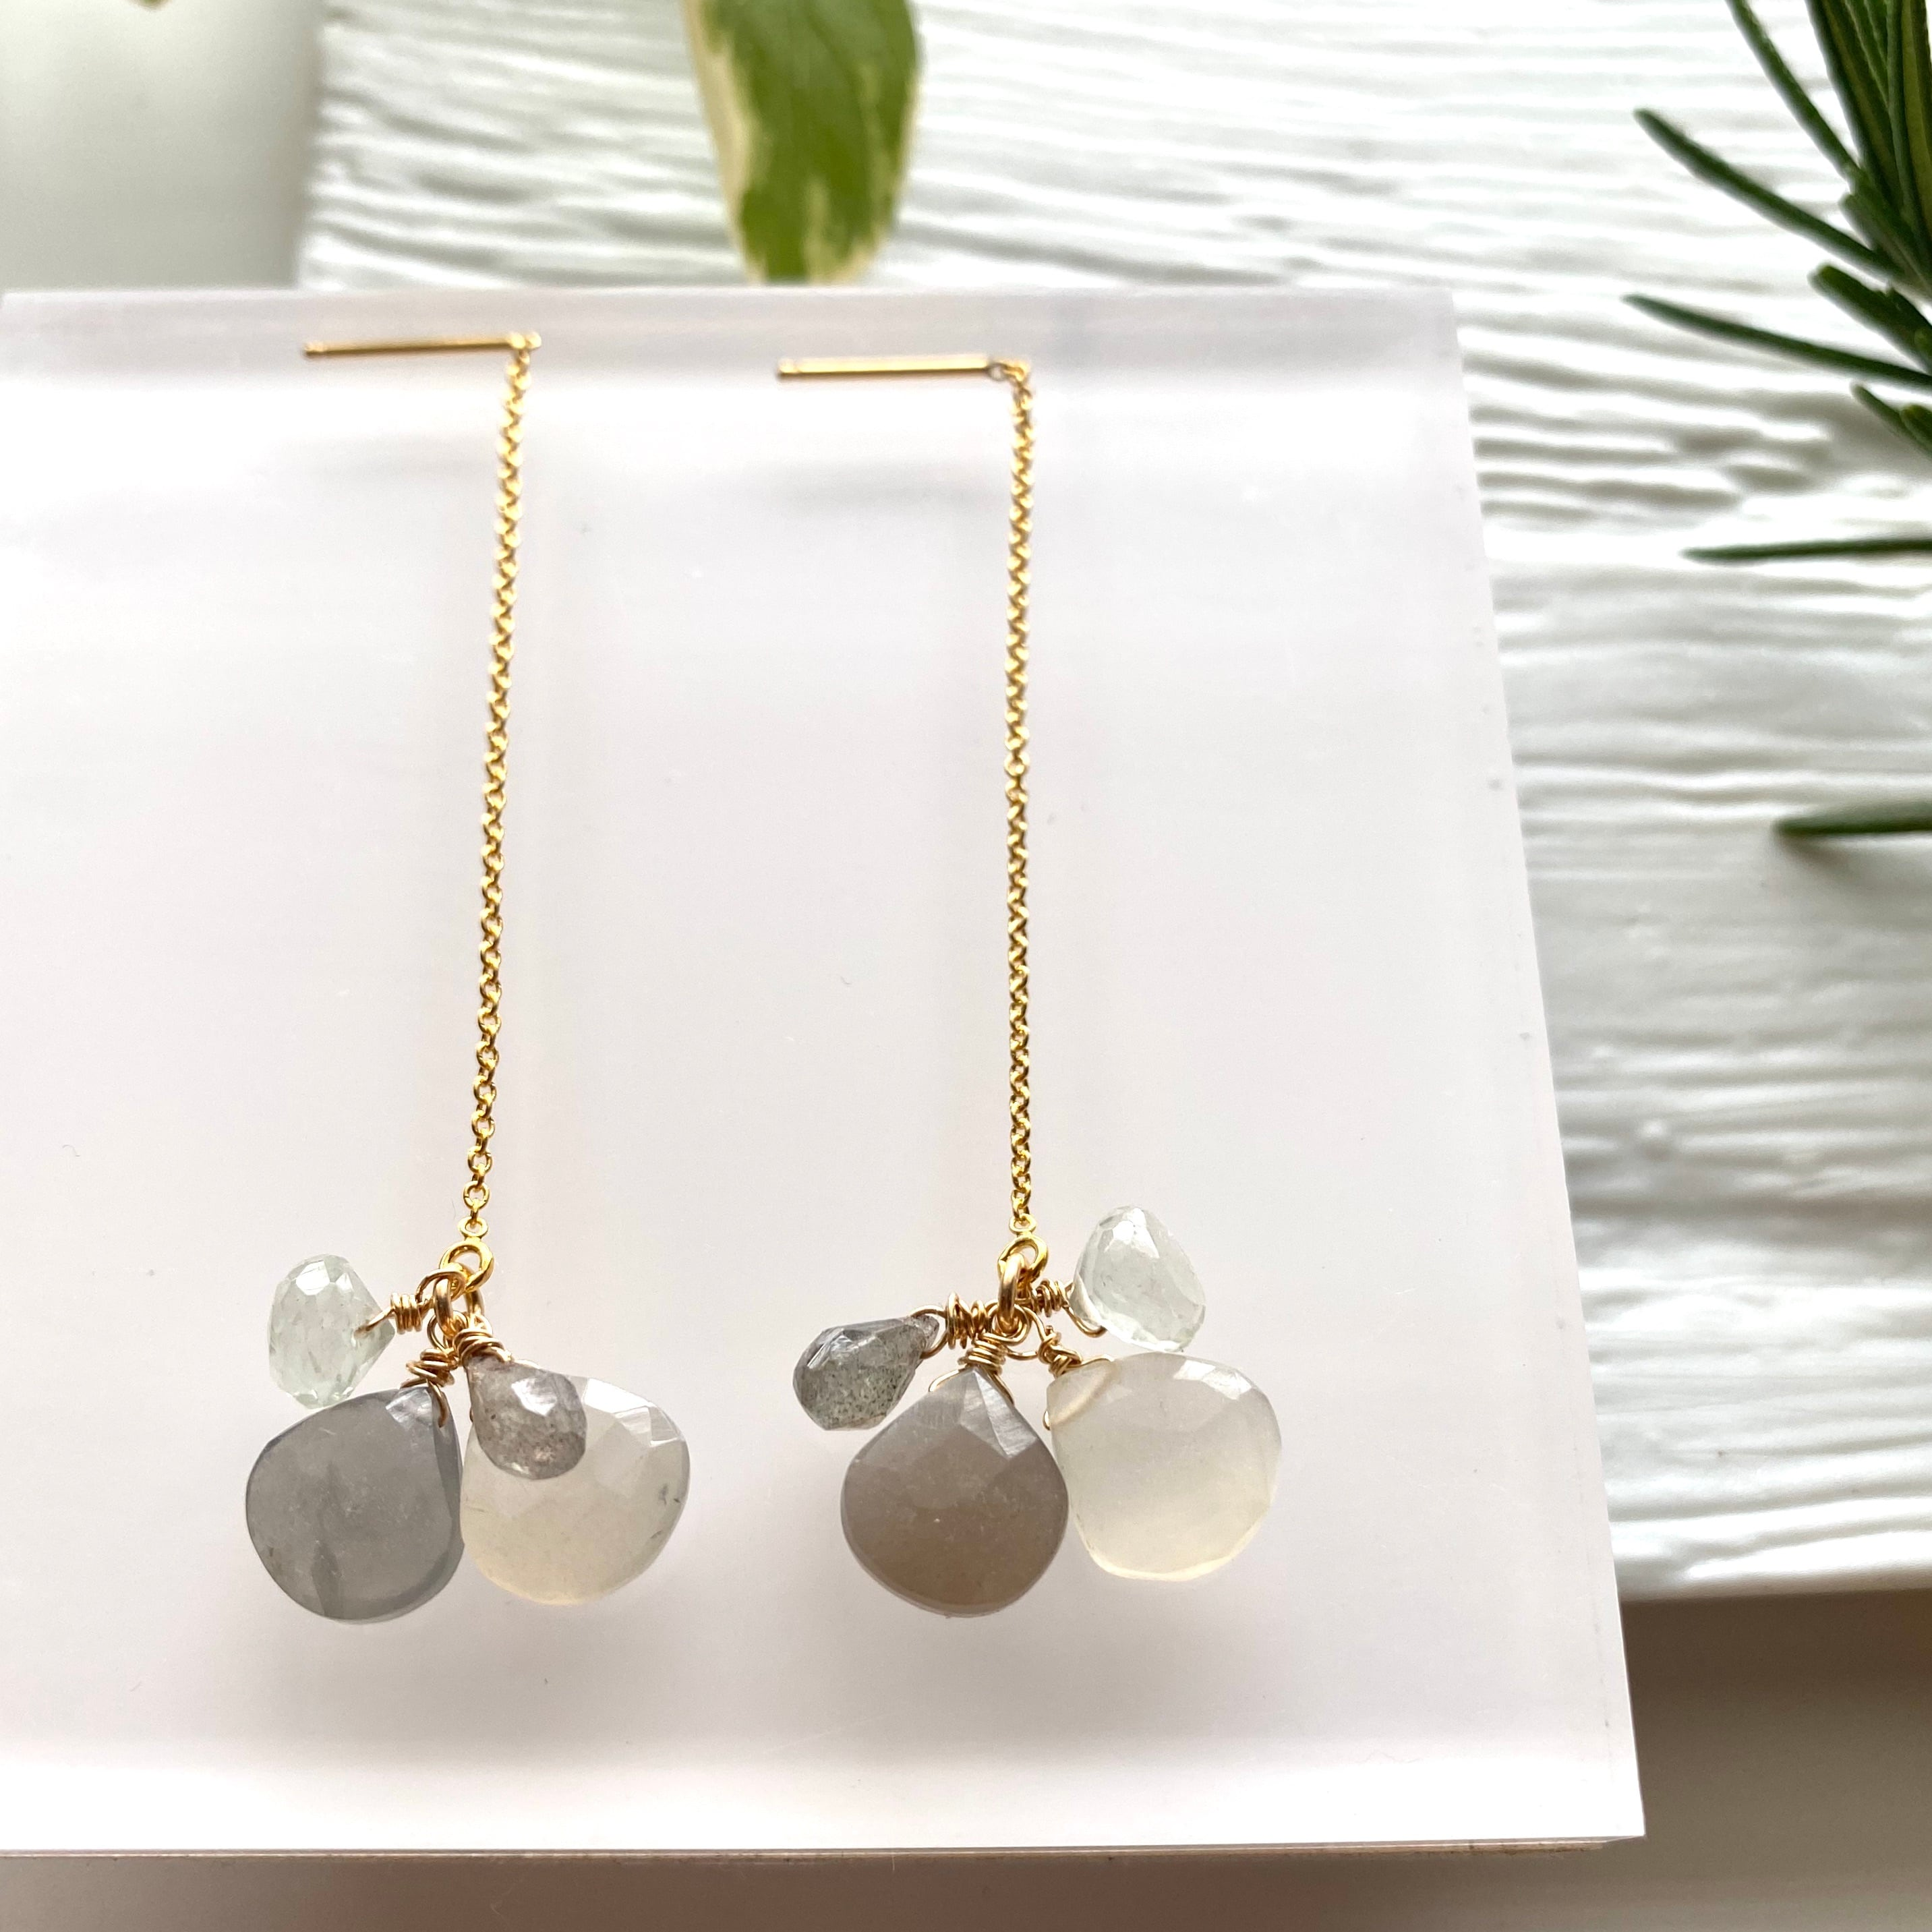 HEMANTI earrings